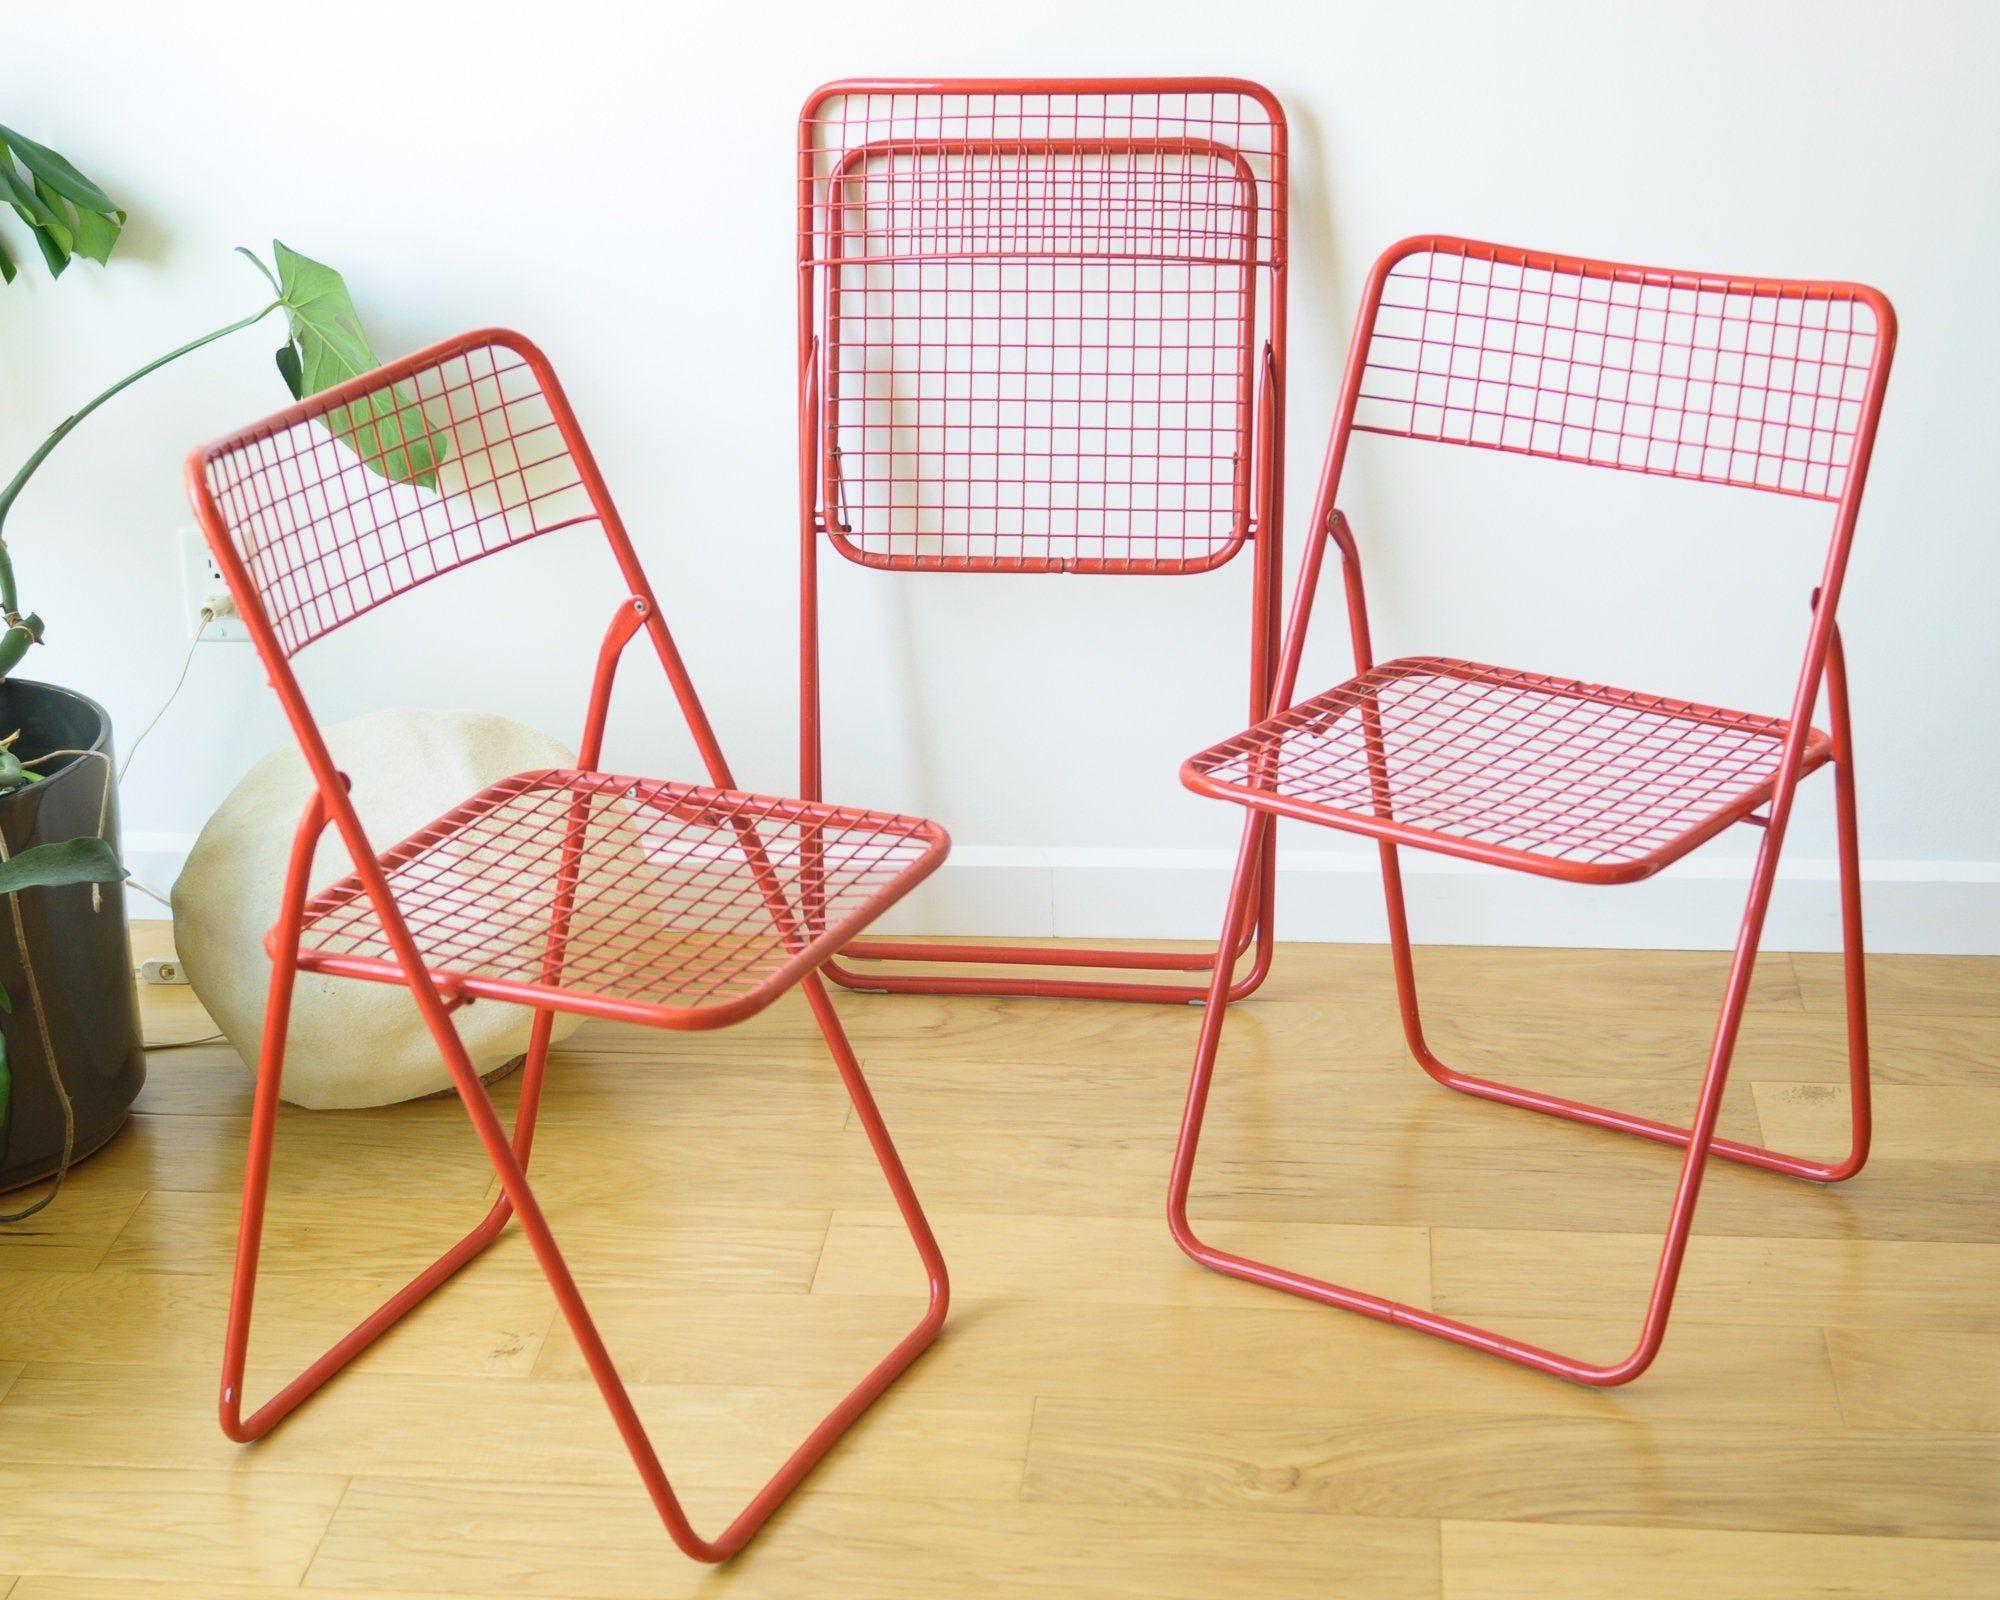 1980s Vintage Ikea Ted Net Chairs By Niels Gammelgaard Folding